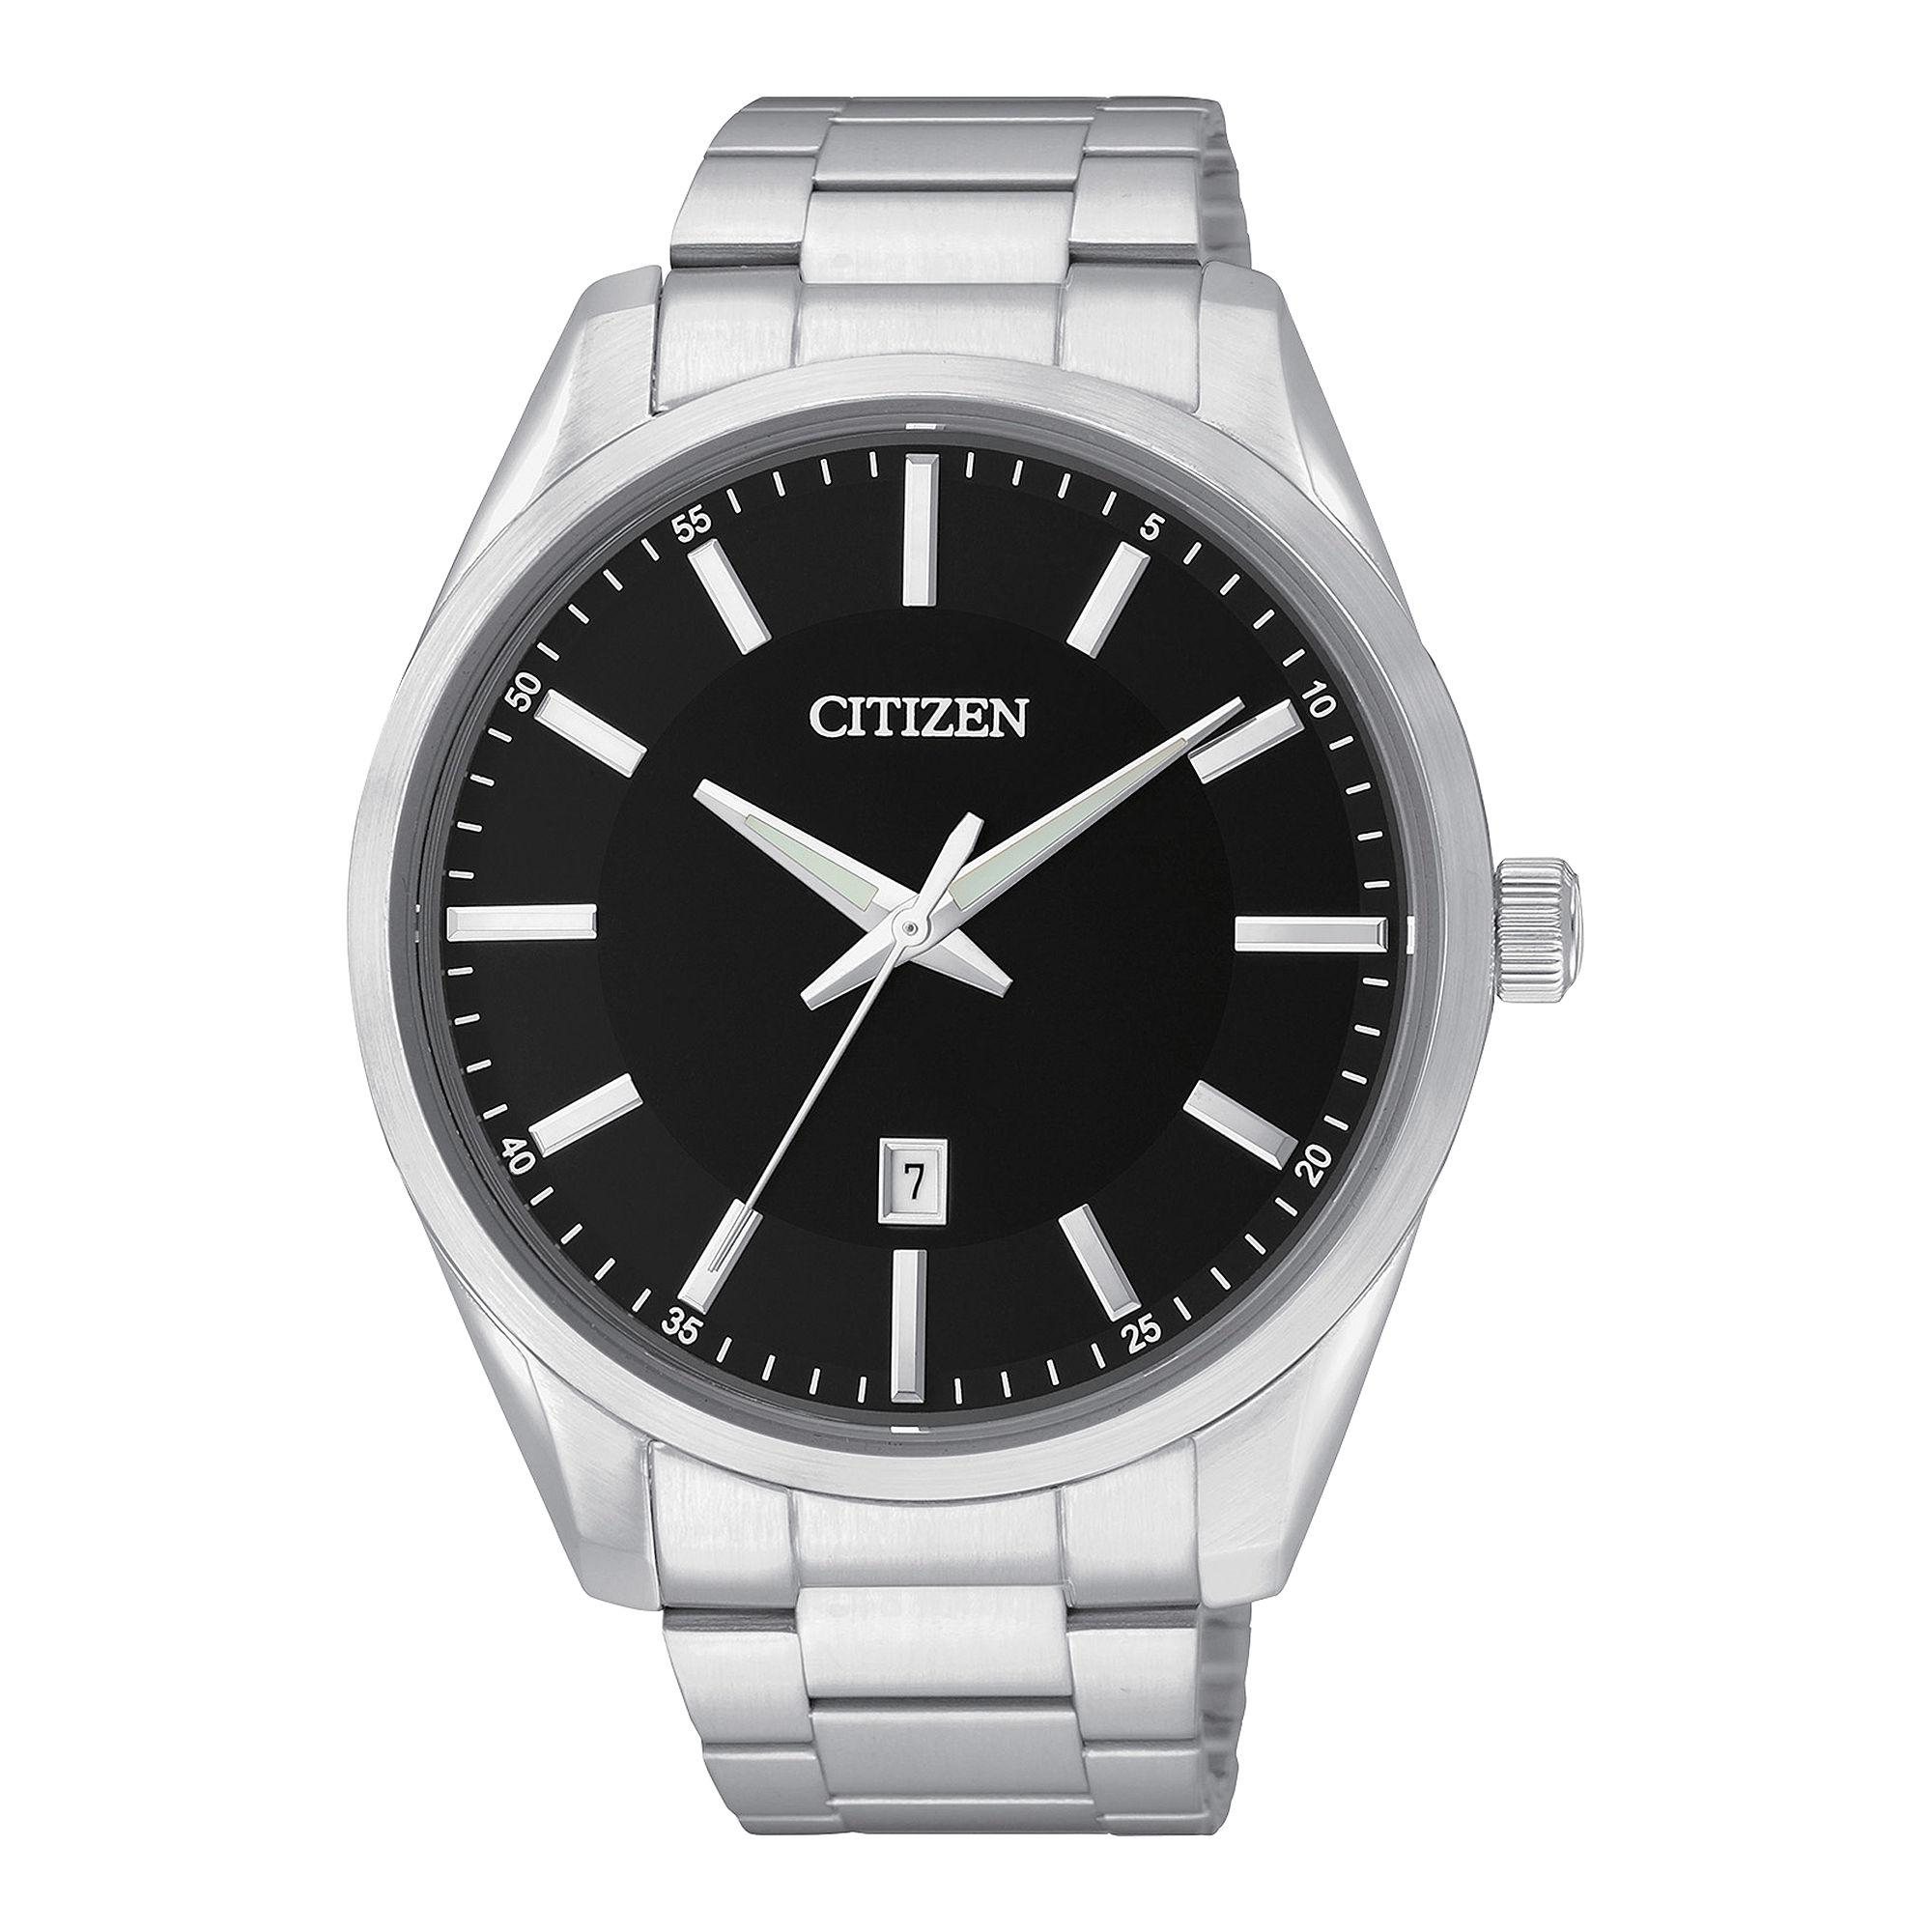 Citizen Mens Black Dial Stainless Steel Watch BI1030-53E